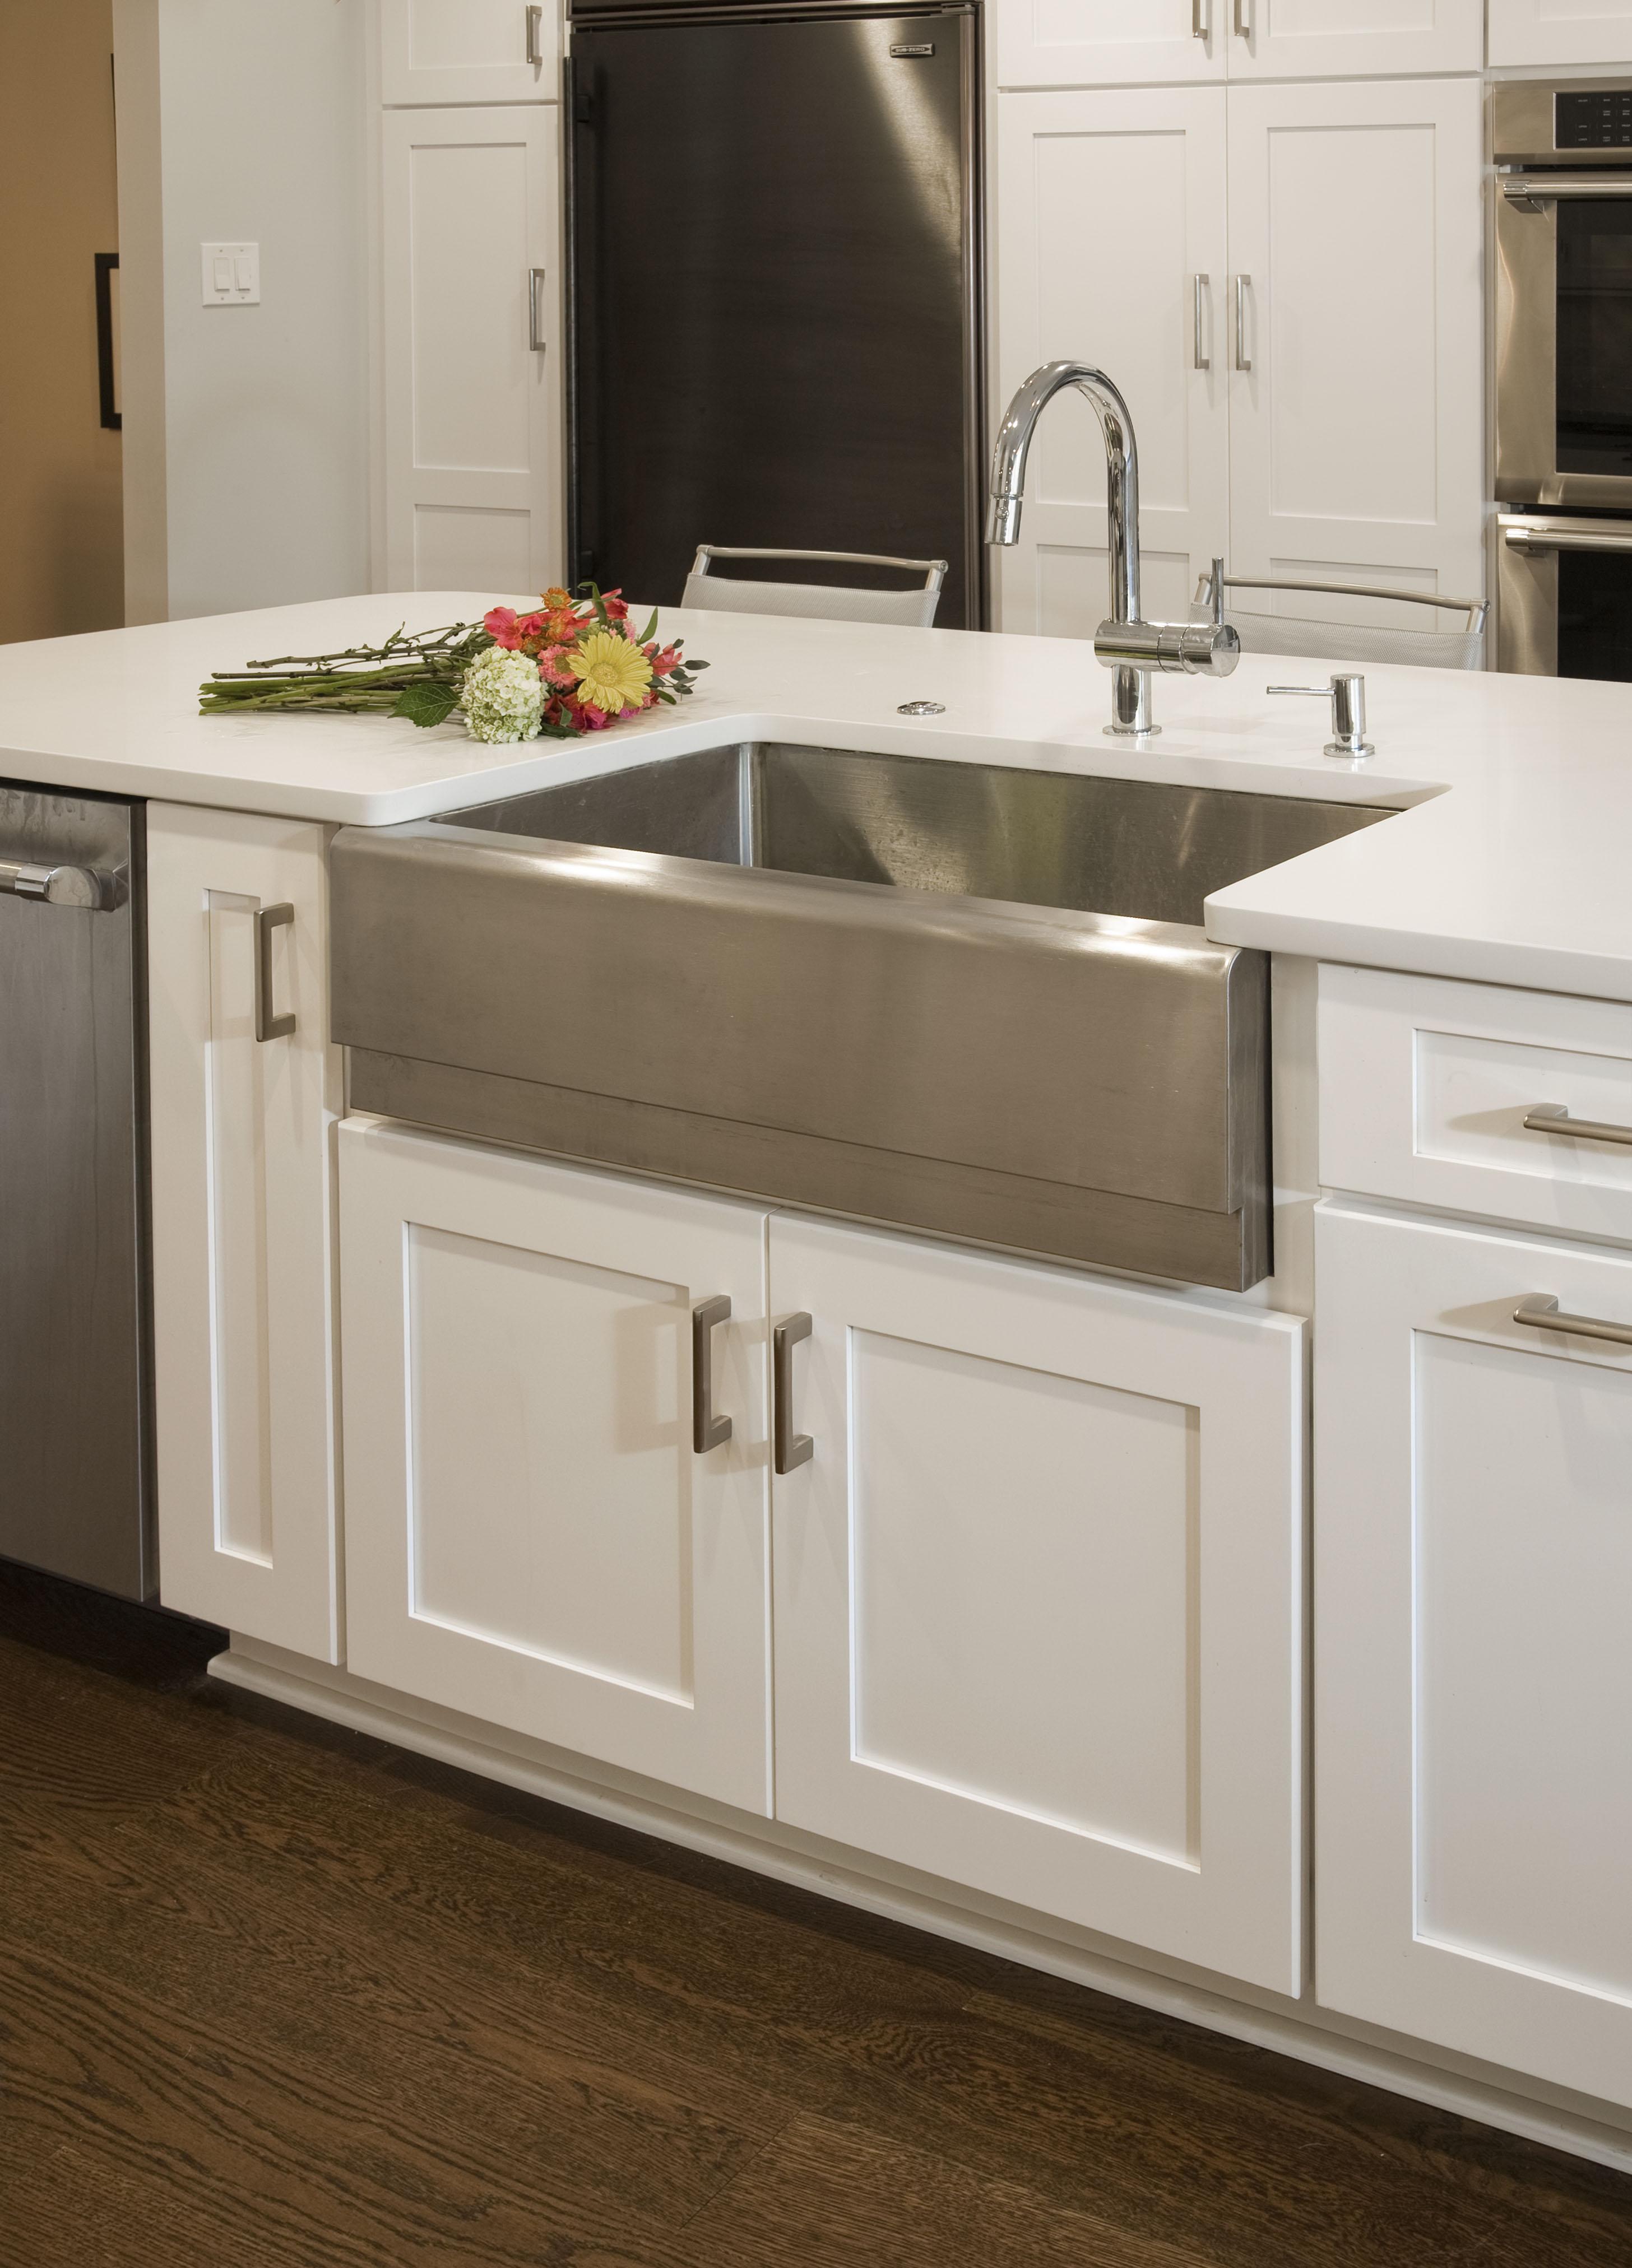 Rustic Kitchen Ideas Small Kitchens